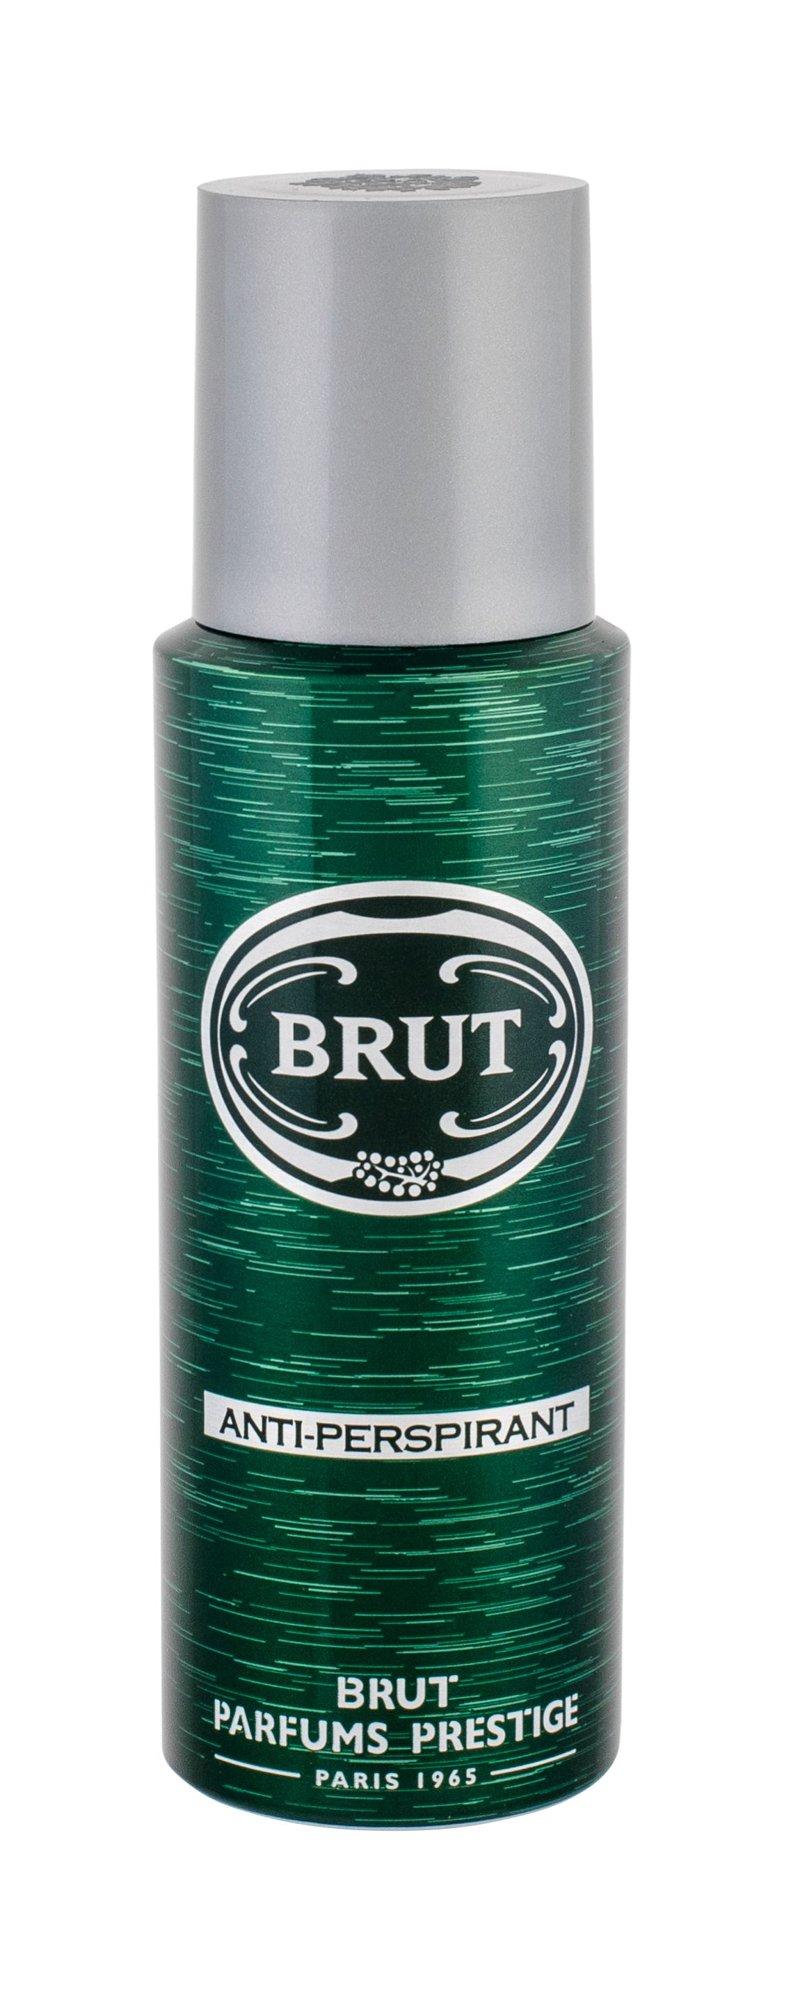 Brut Brut Original Antiperspirant 200ml